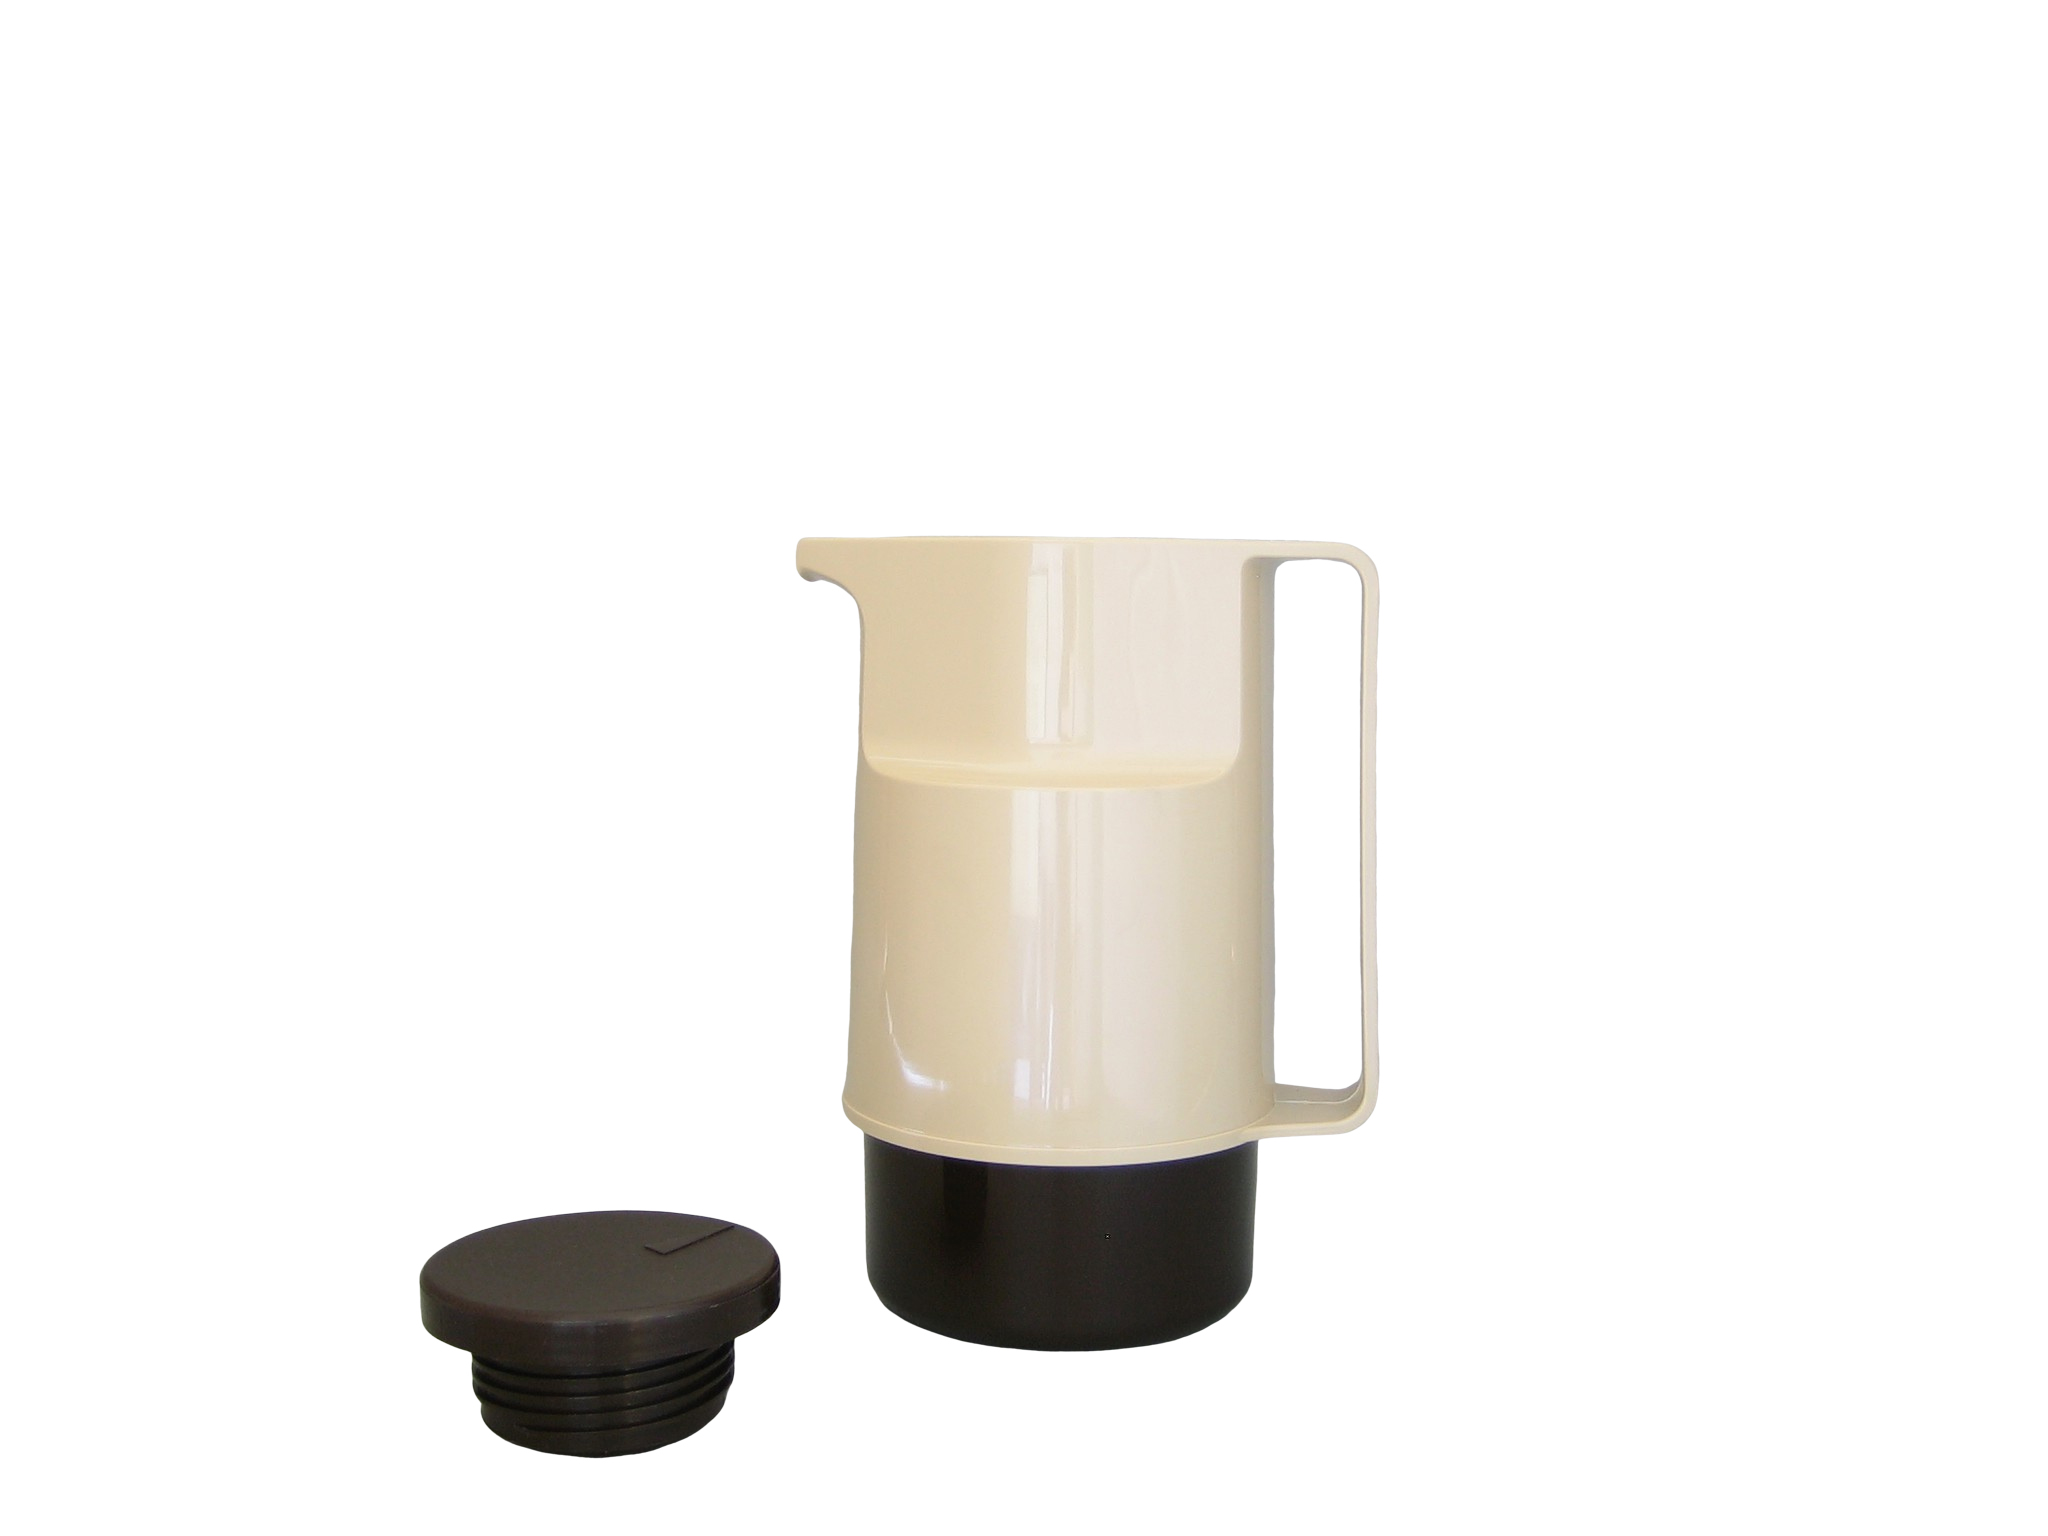 206-1030 - Vacuum carafe ABS beige/brown 0.60 L - Isobel